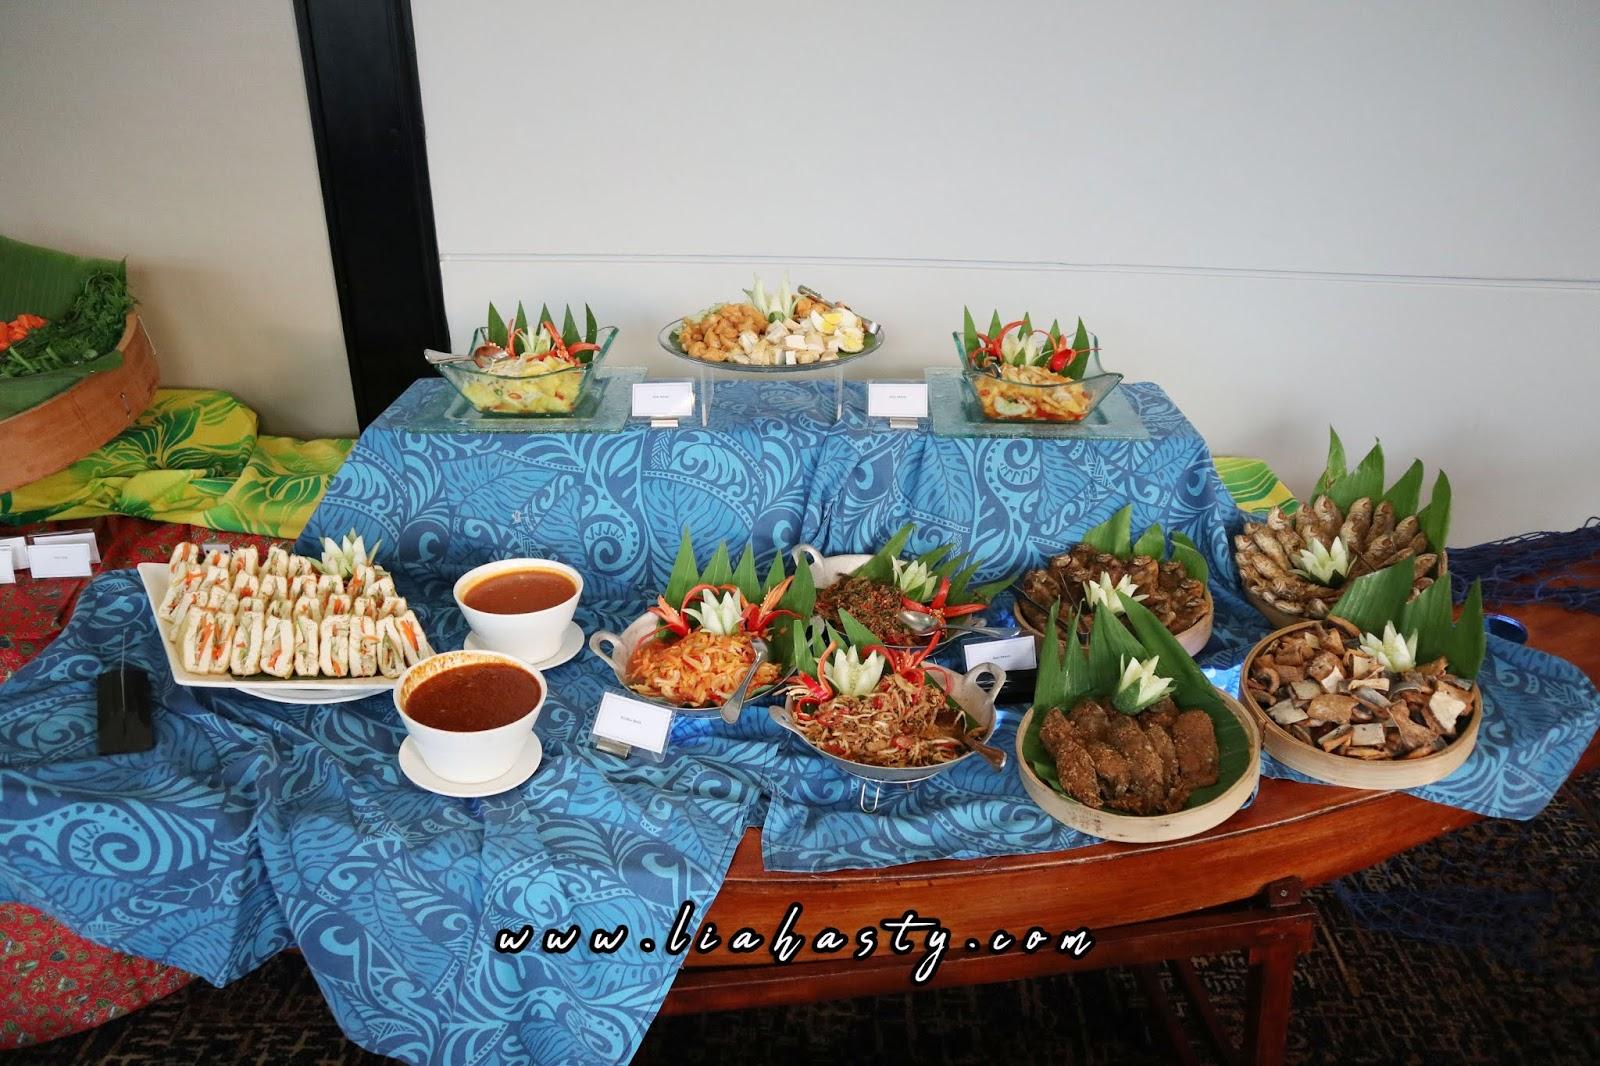 Resepi Gulai Udang Kacang Buncis - Kota Joglo